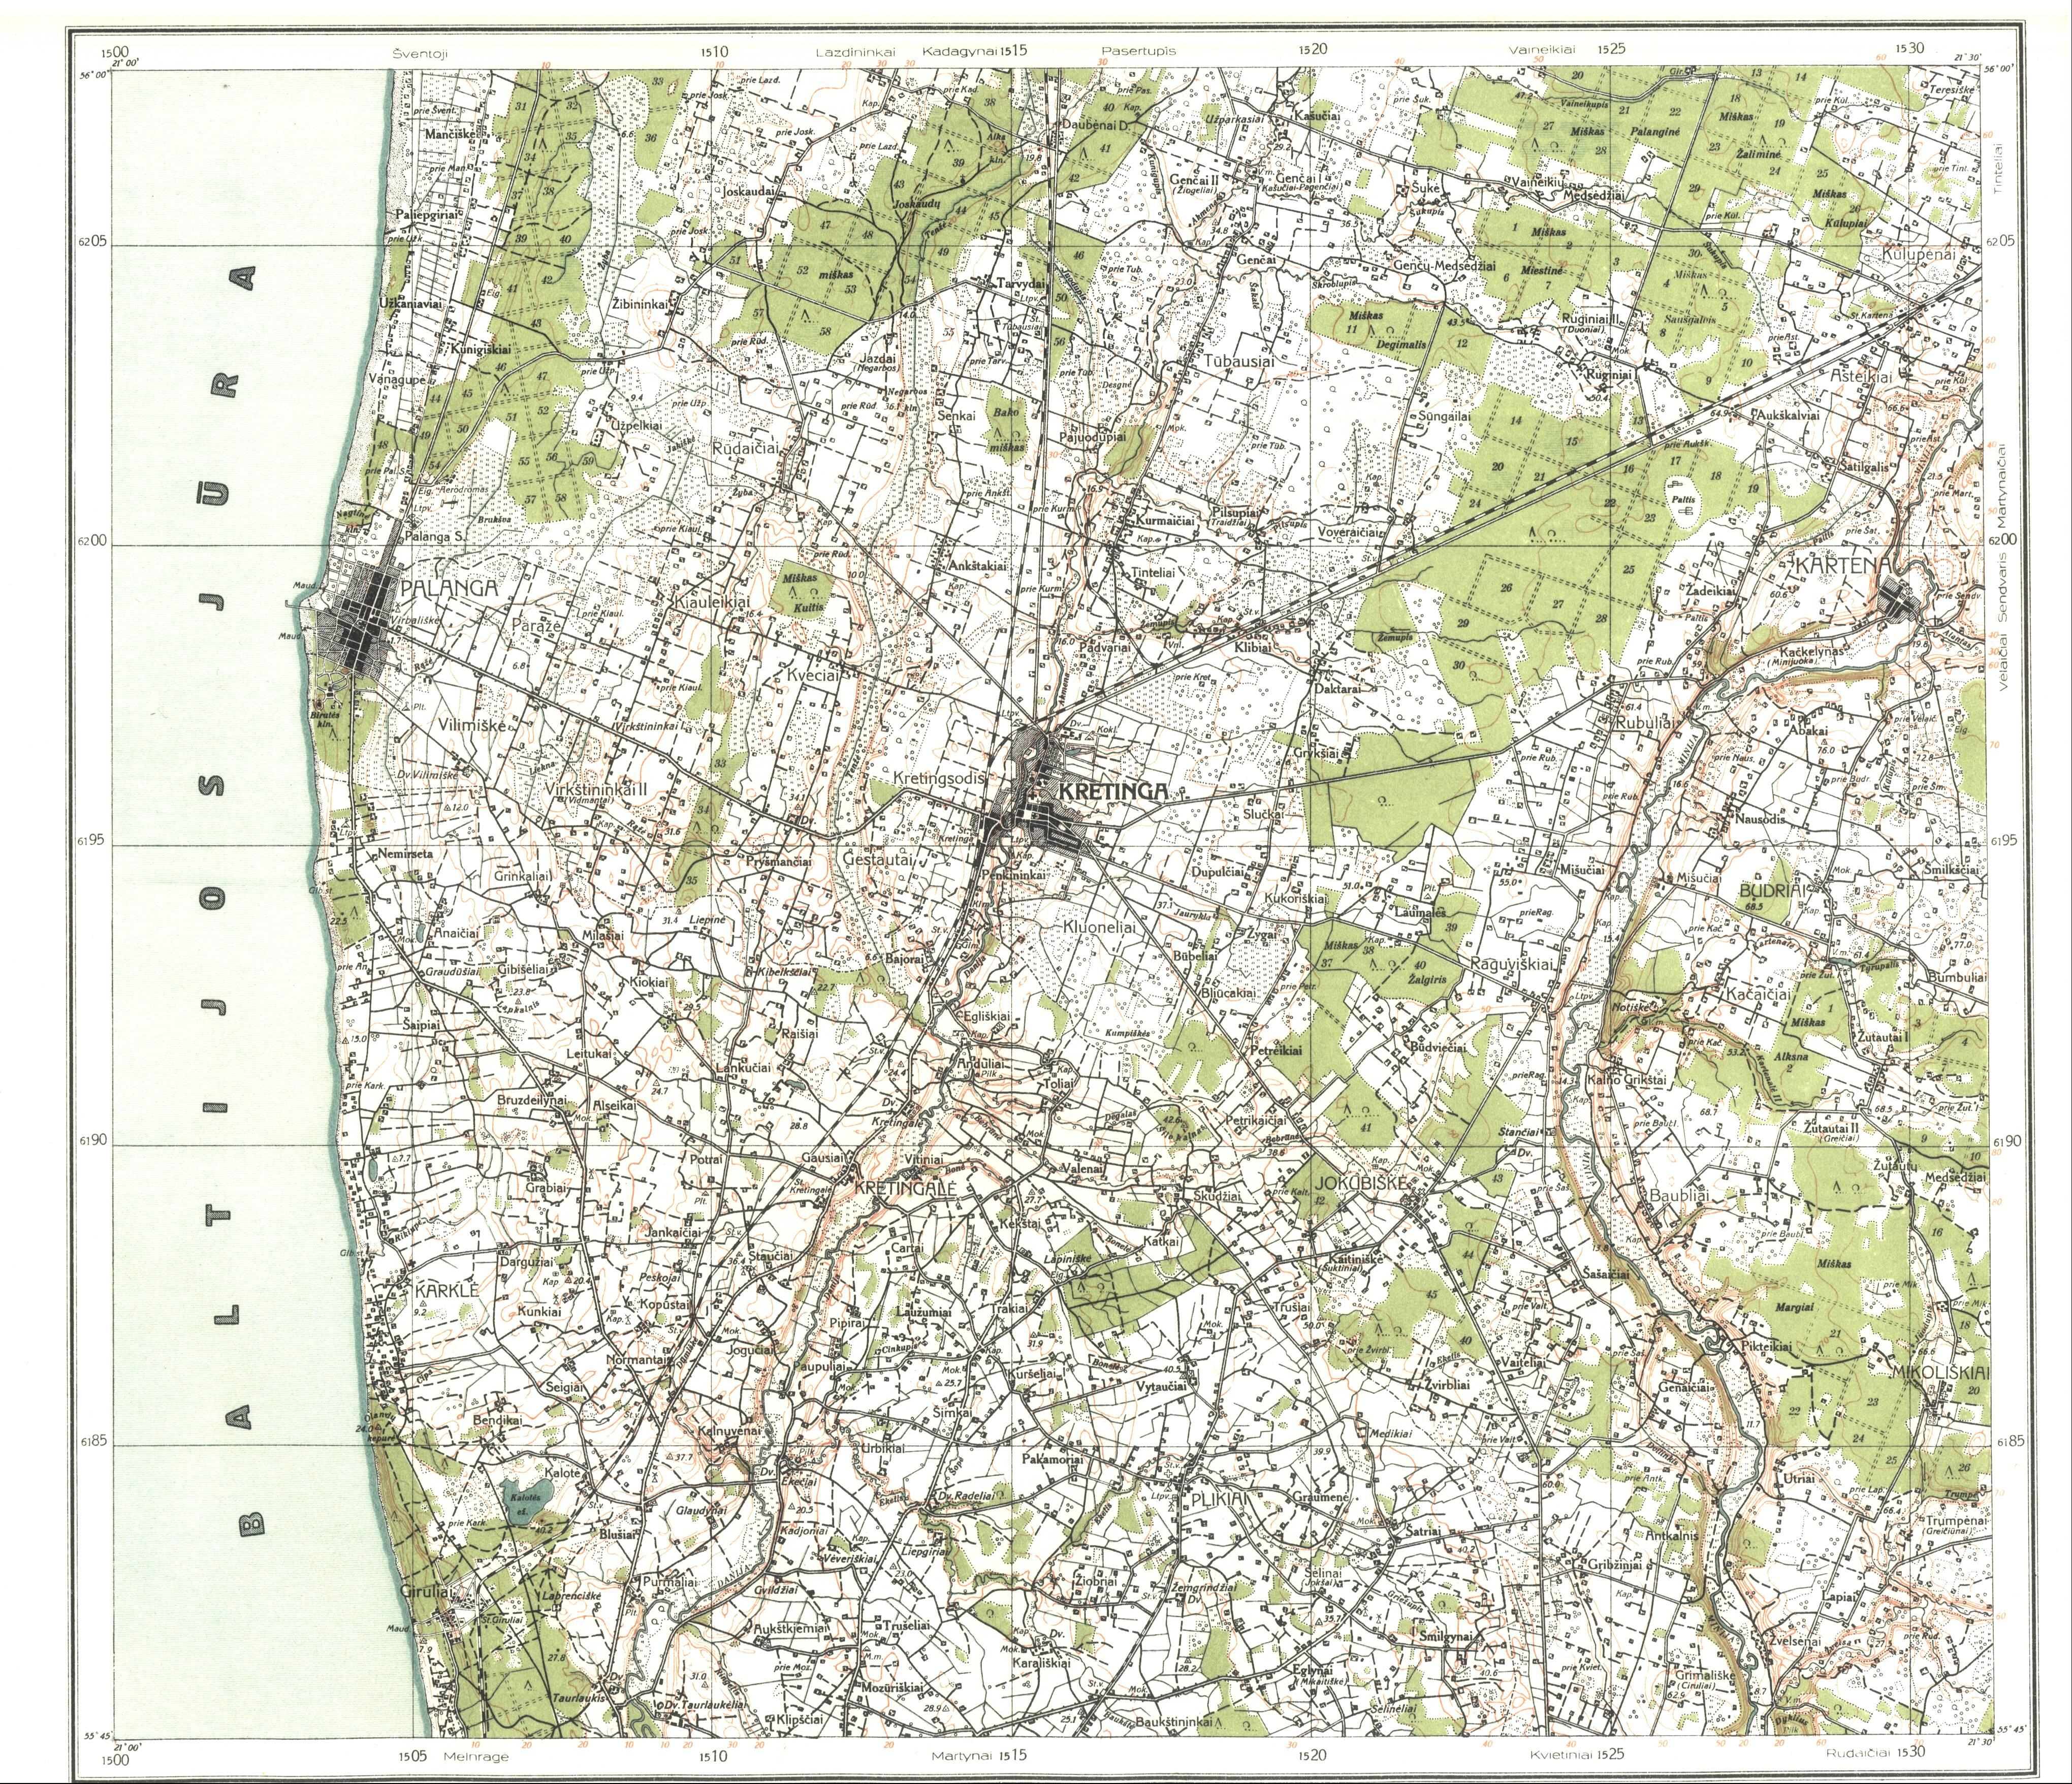 Maps1930-39 Yahoo Maps Russia on intel maps russia, youtube russia, google maps russia, bing maps russia, sightseeing russia,